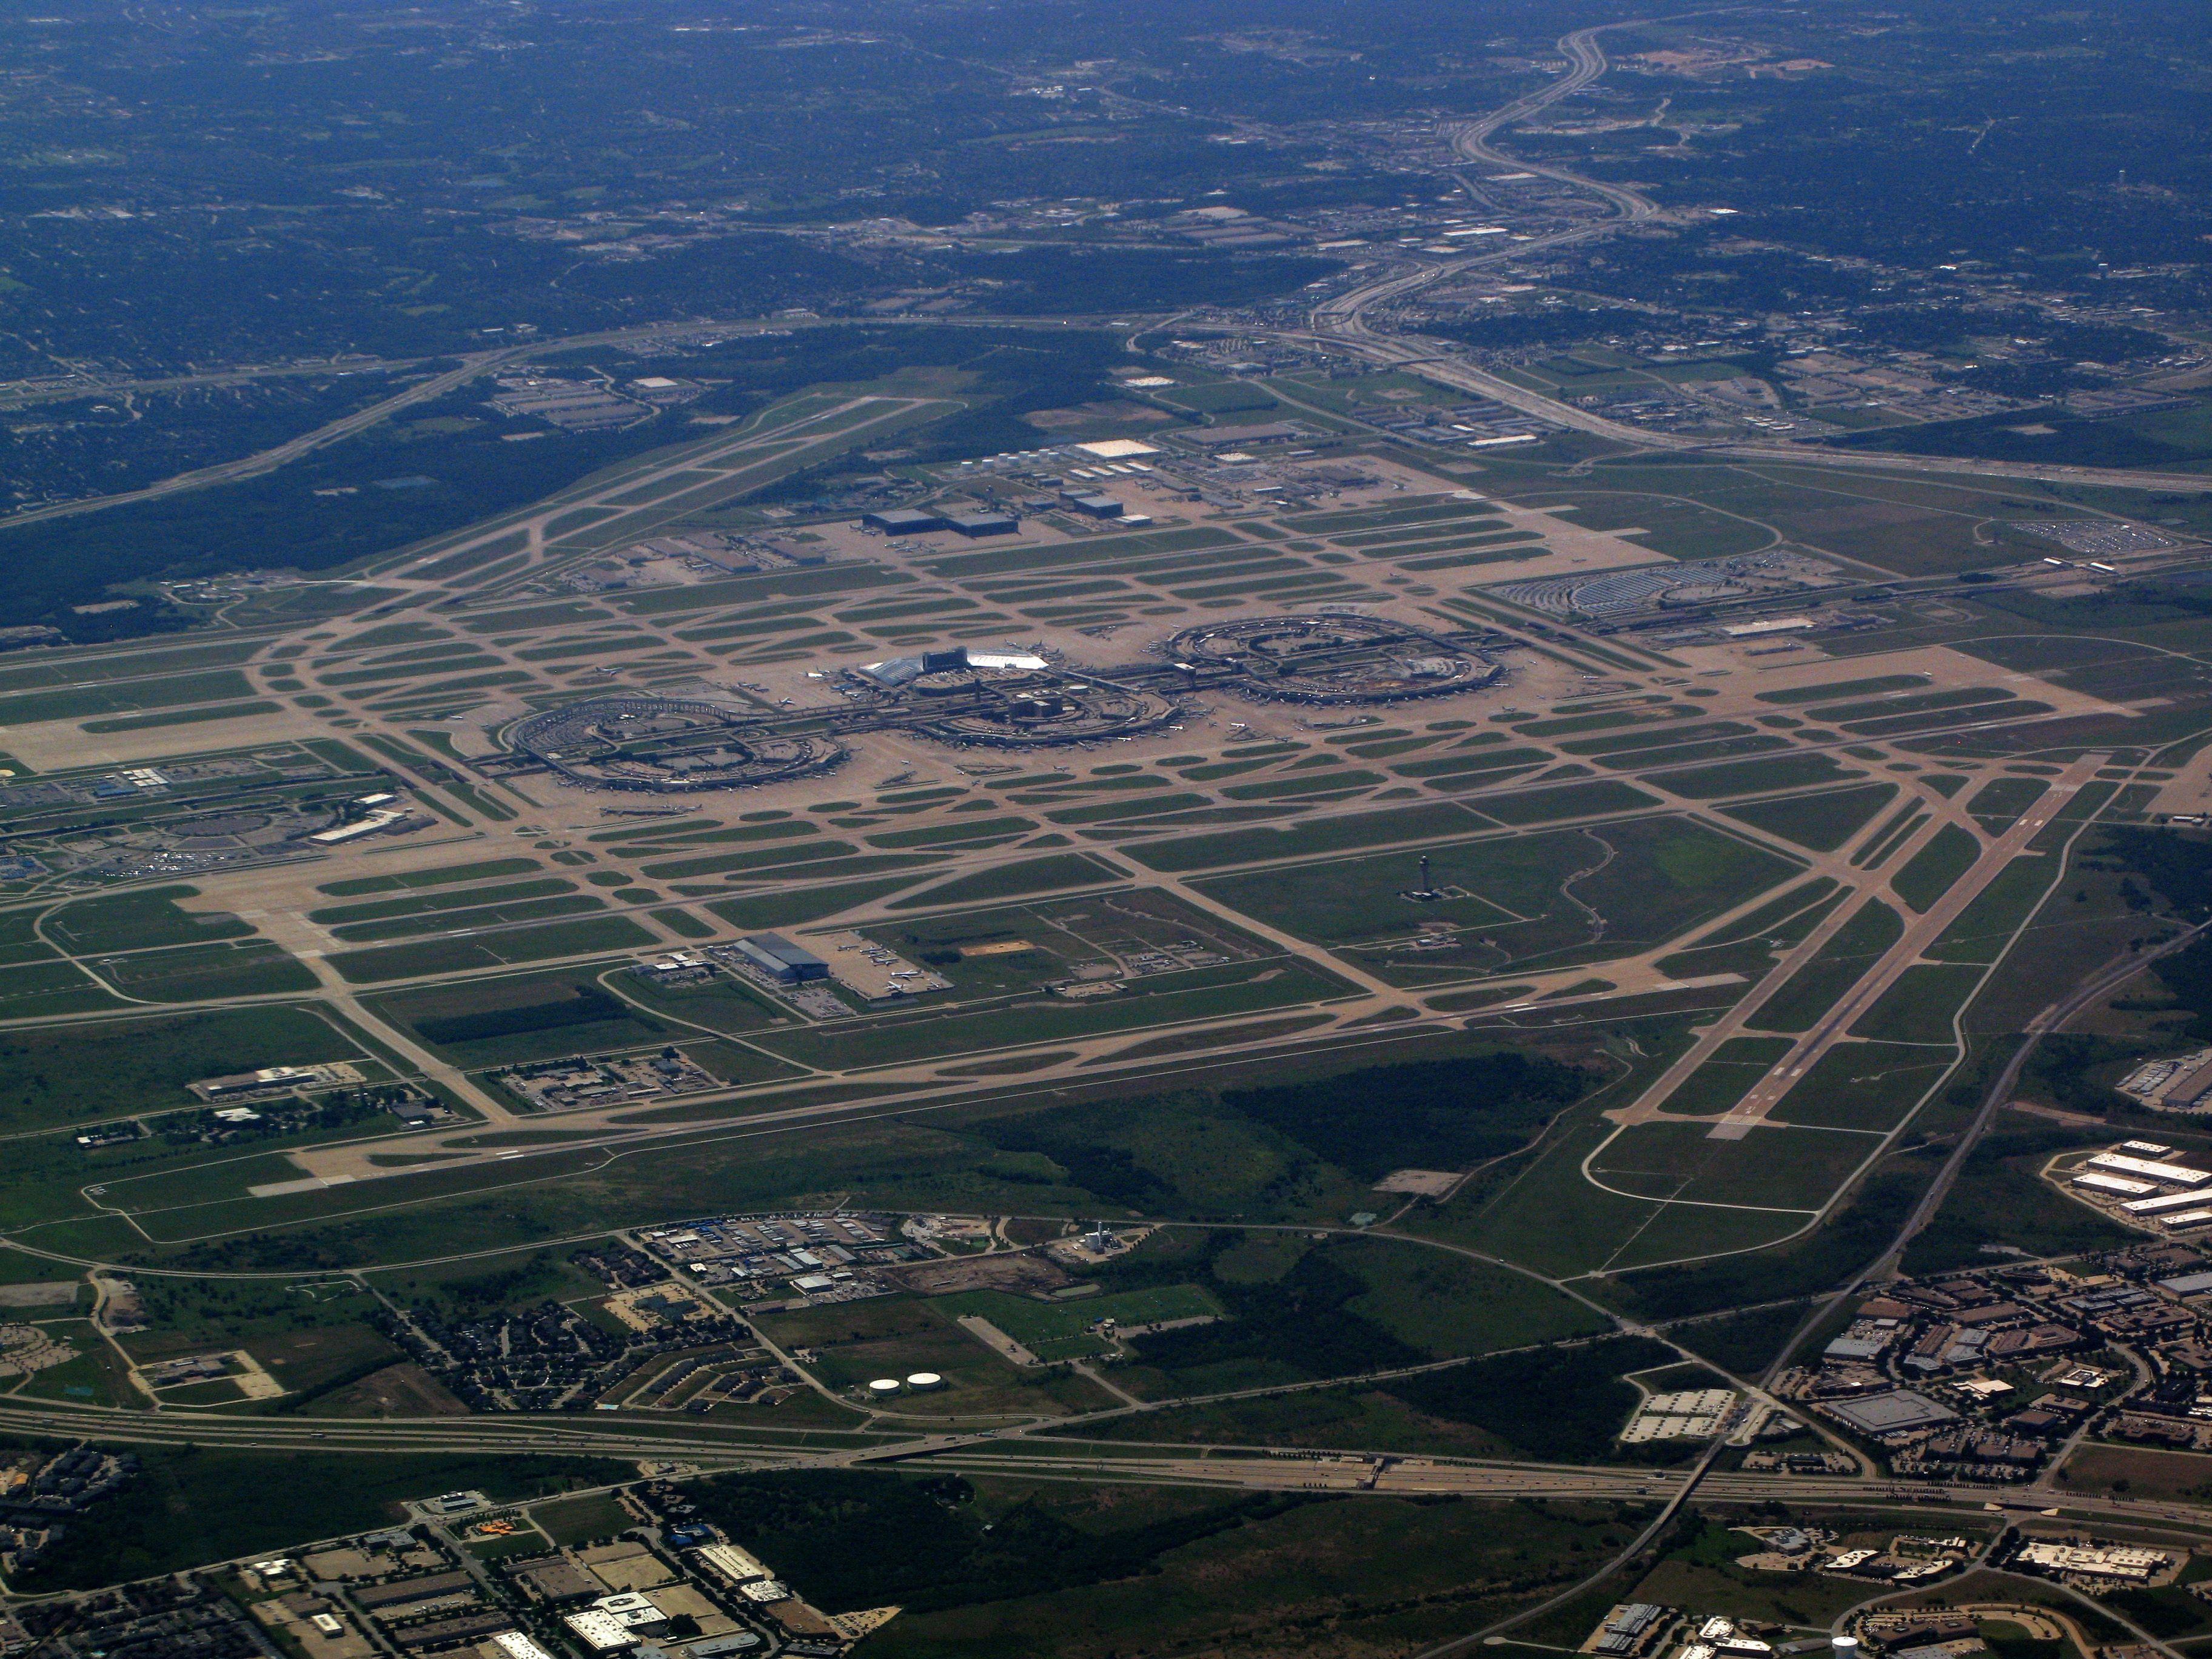 Rental Car Deals Found Dallas Fort Worth International Airport Aviation D Dallas Fort Worth International Airport Dallas Fort Worth International Airport